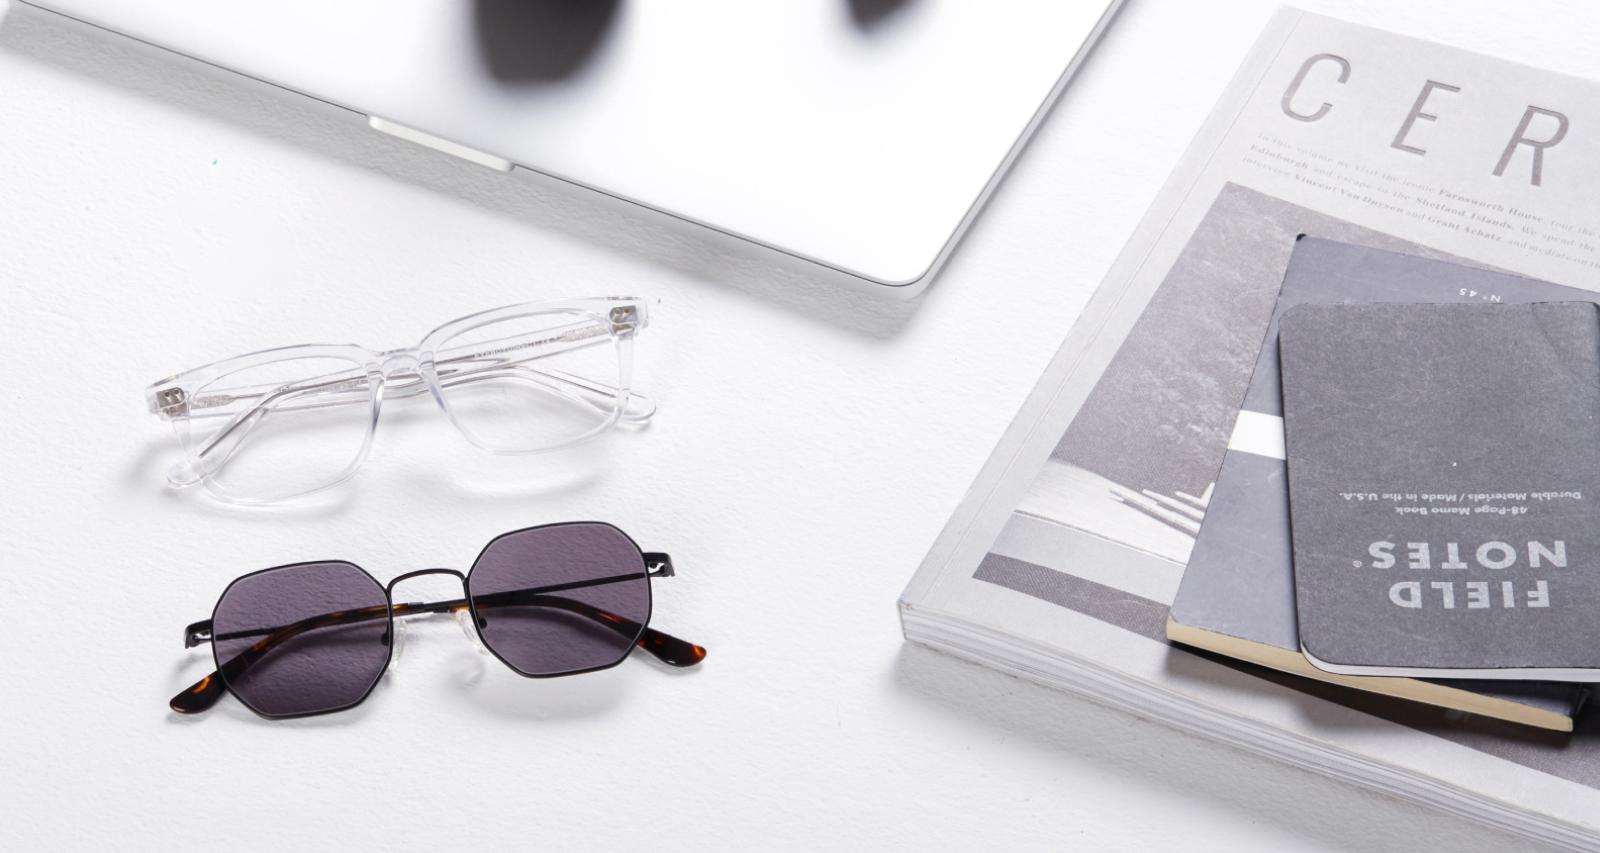 acb2f34a064 Ladies Eyeglasses Aurora Flecked Ivory - Blog